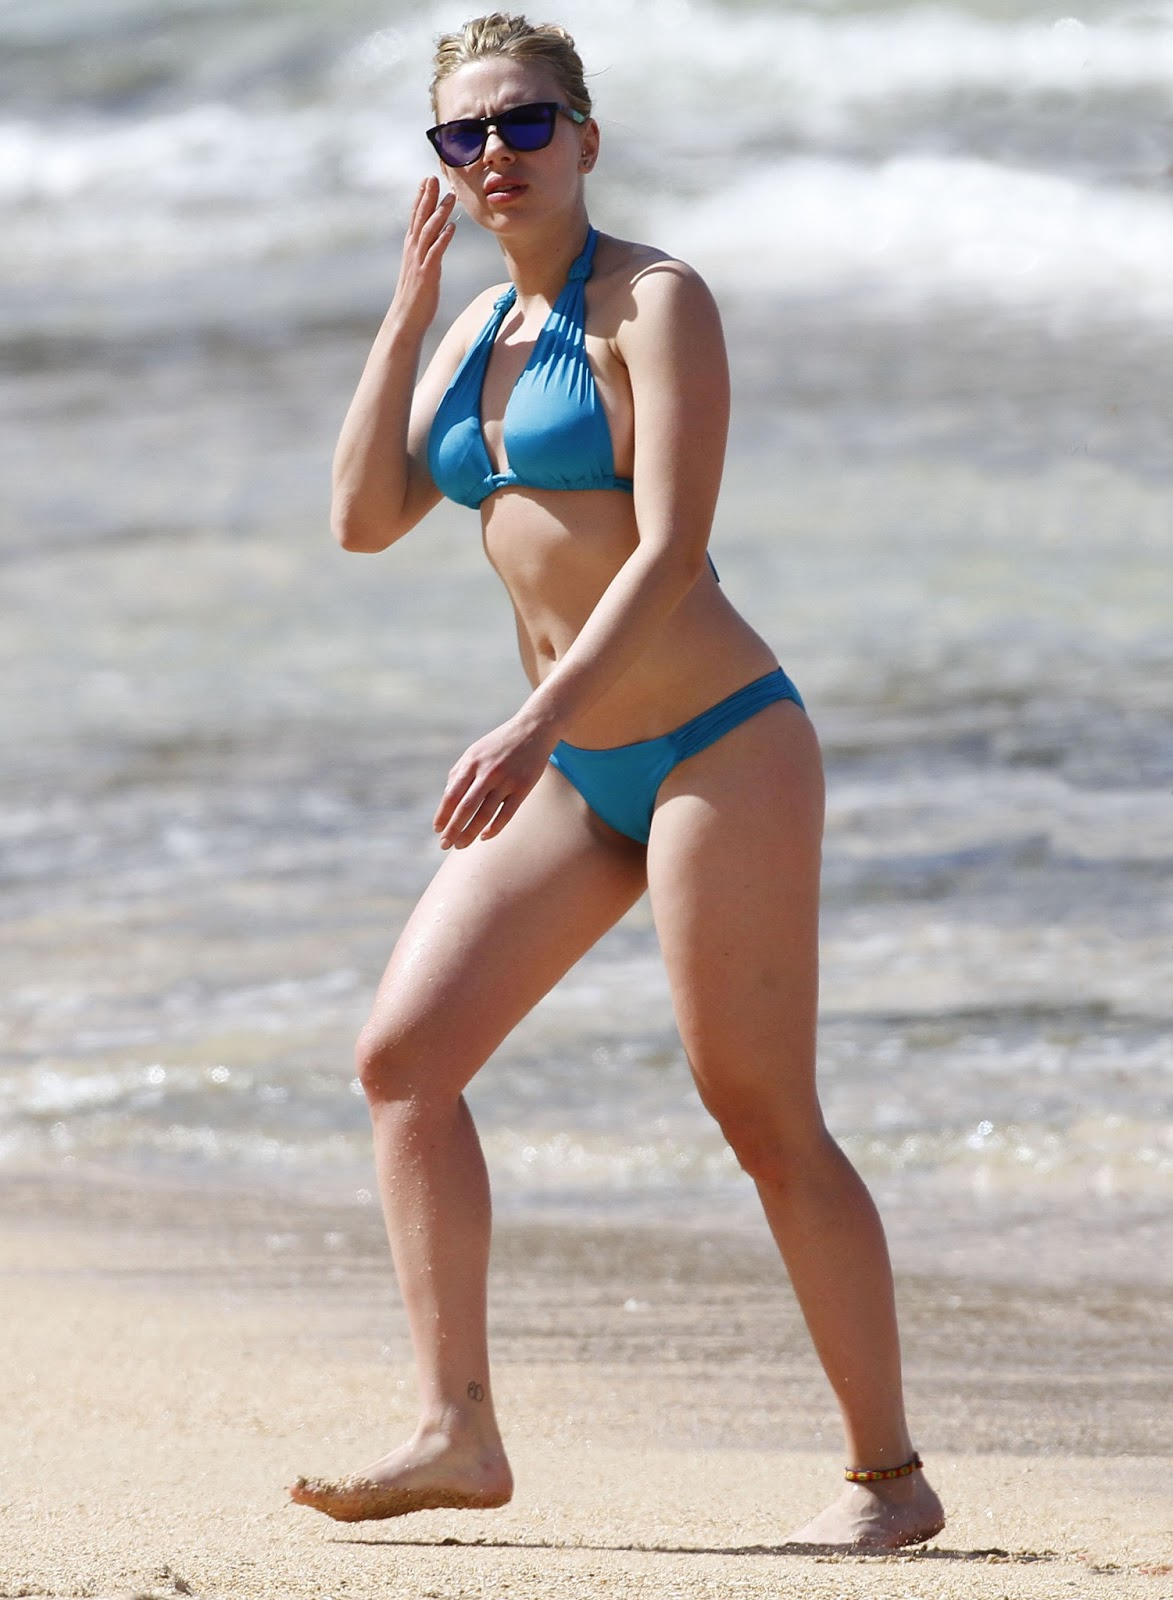 Scarlett Johansson Bikini Pictures | HOT CELEBRITIES ALL OVER THE